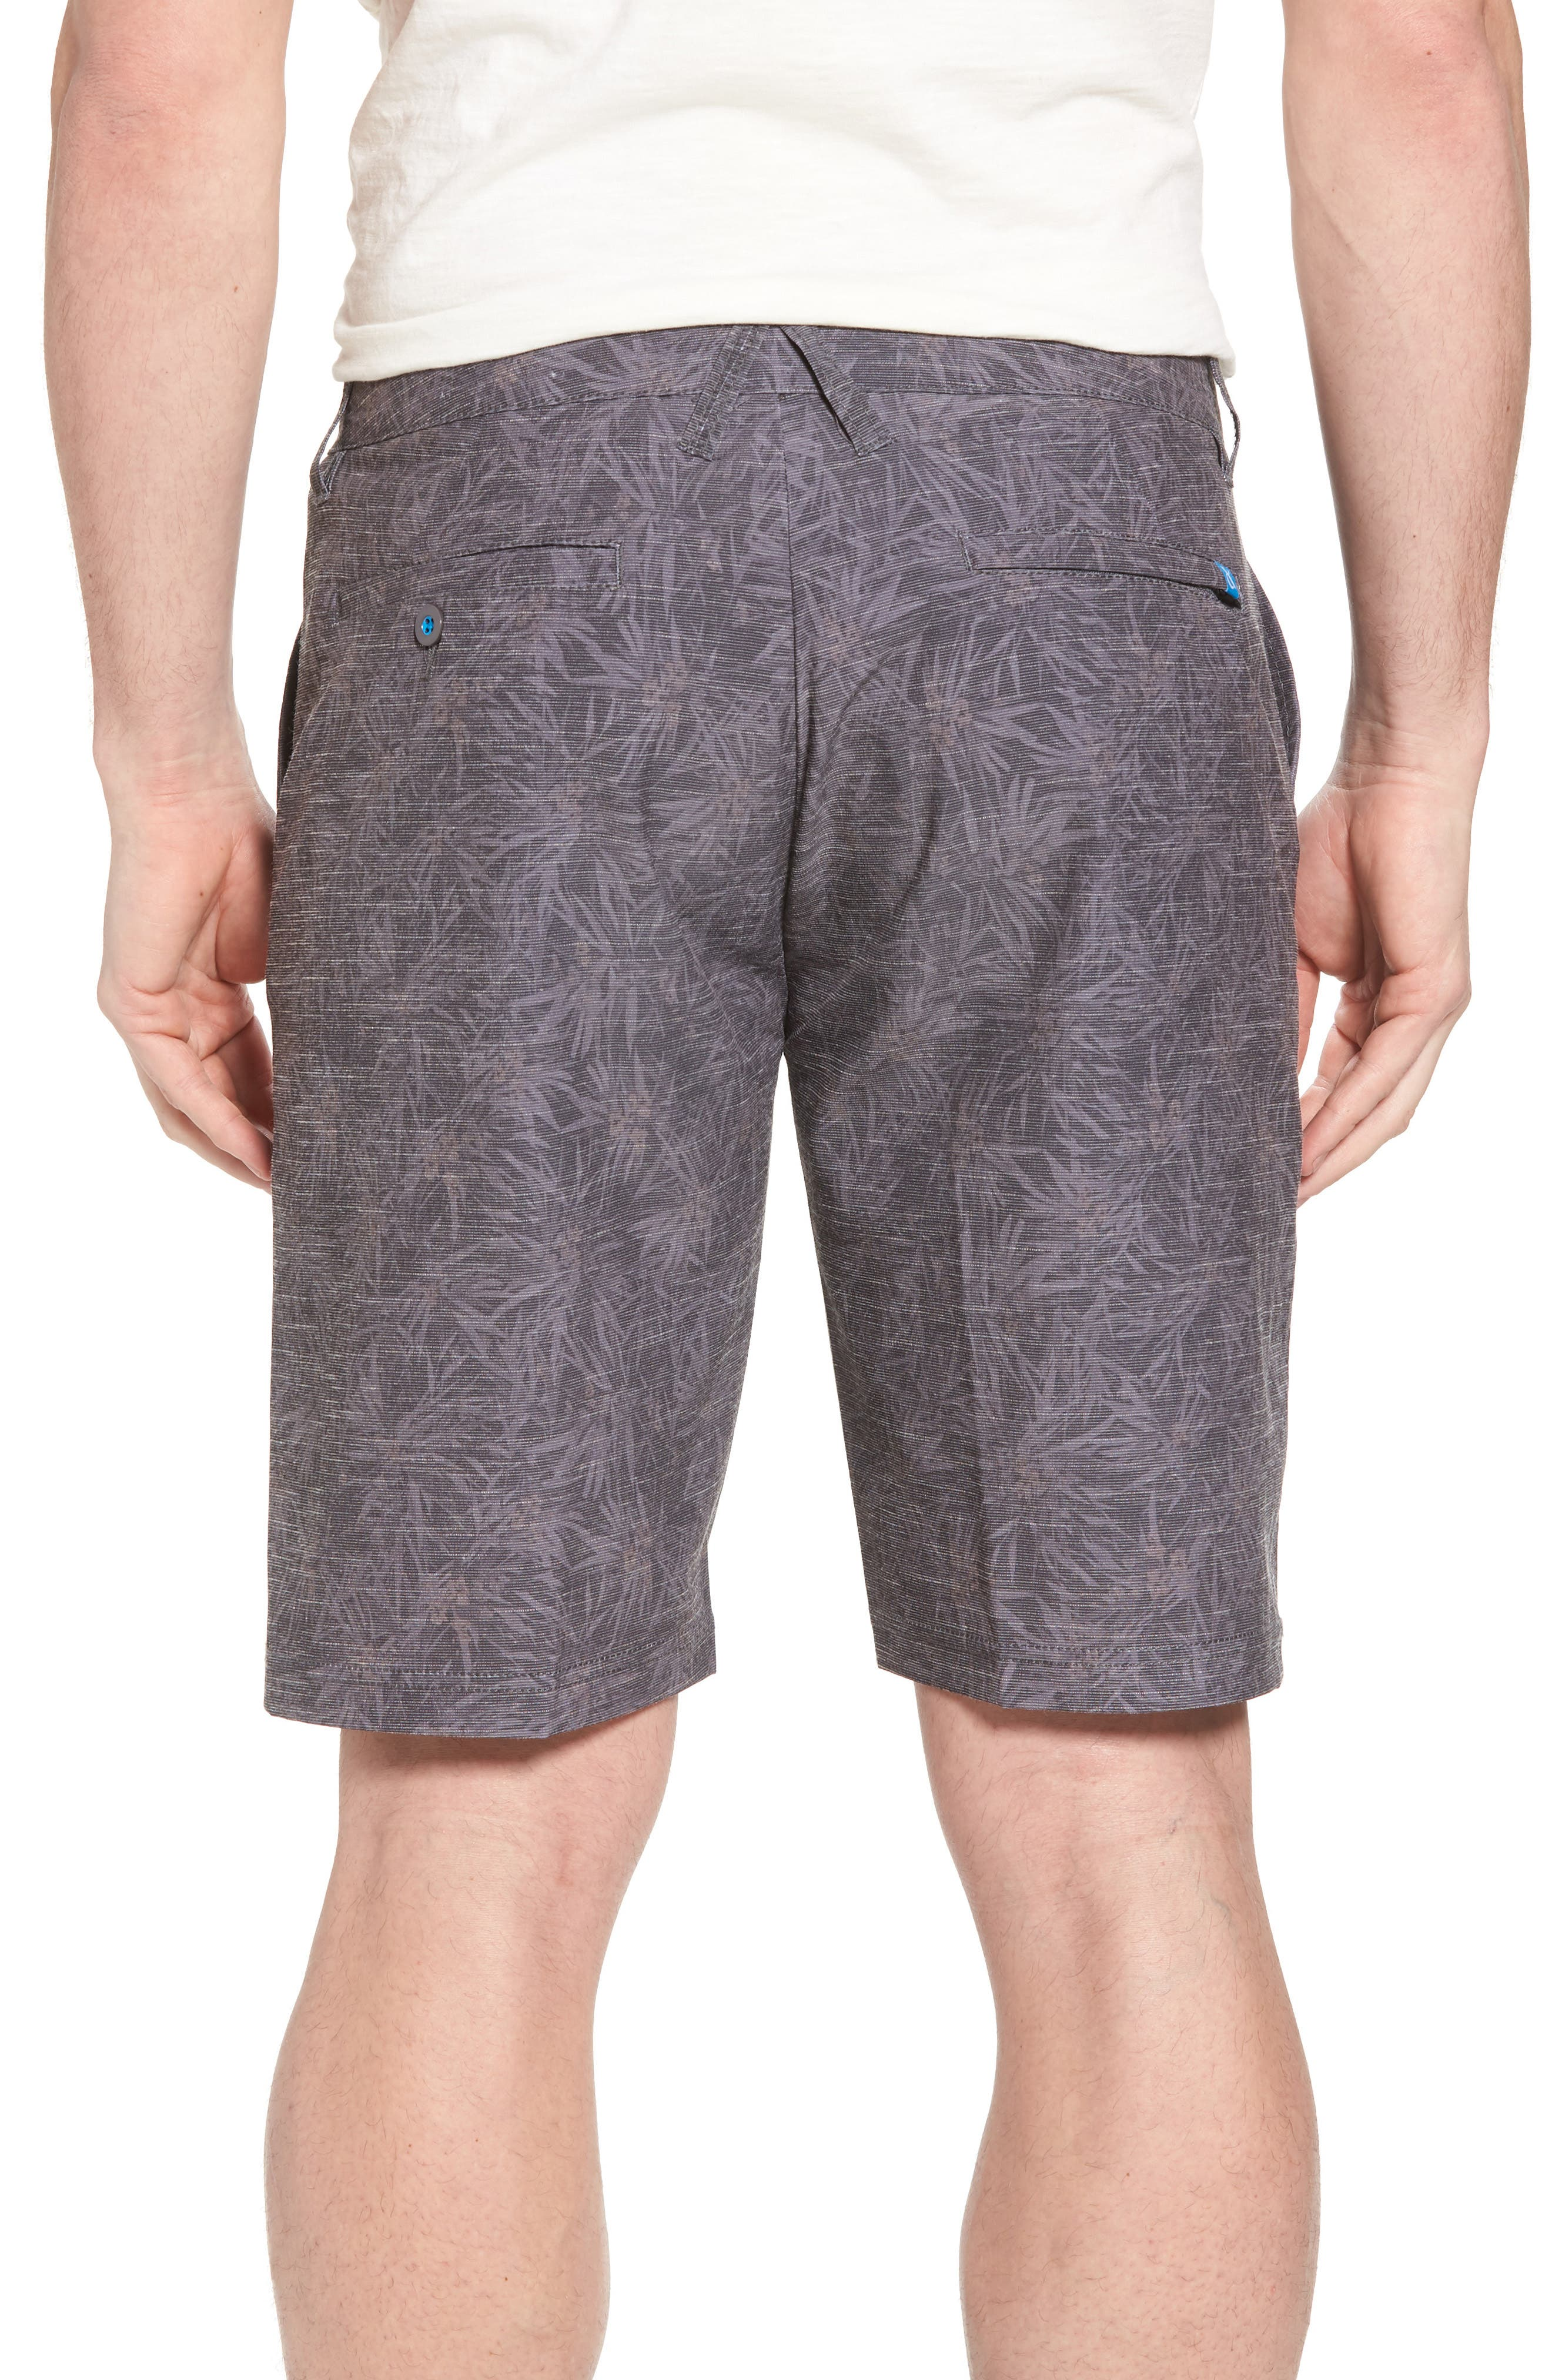 Cruiser Hybrid Shorts,                             Alternate thumbnail 3, color,                             Tropic Camo